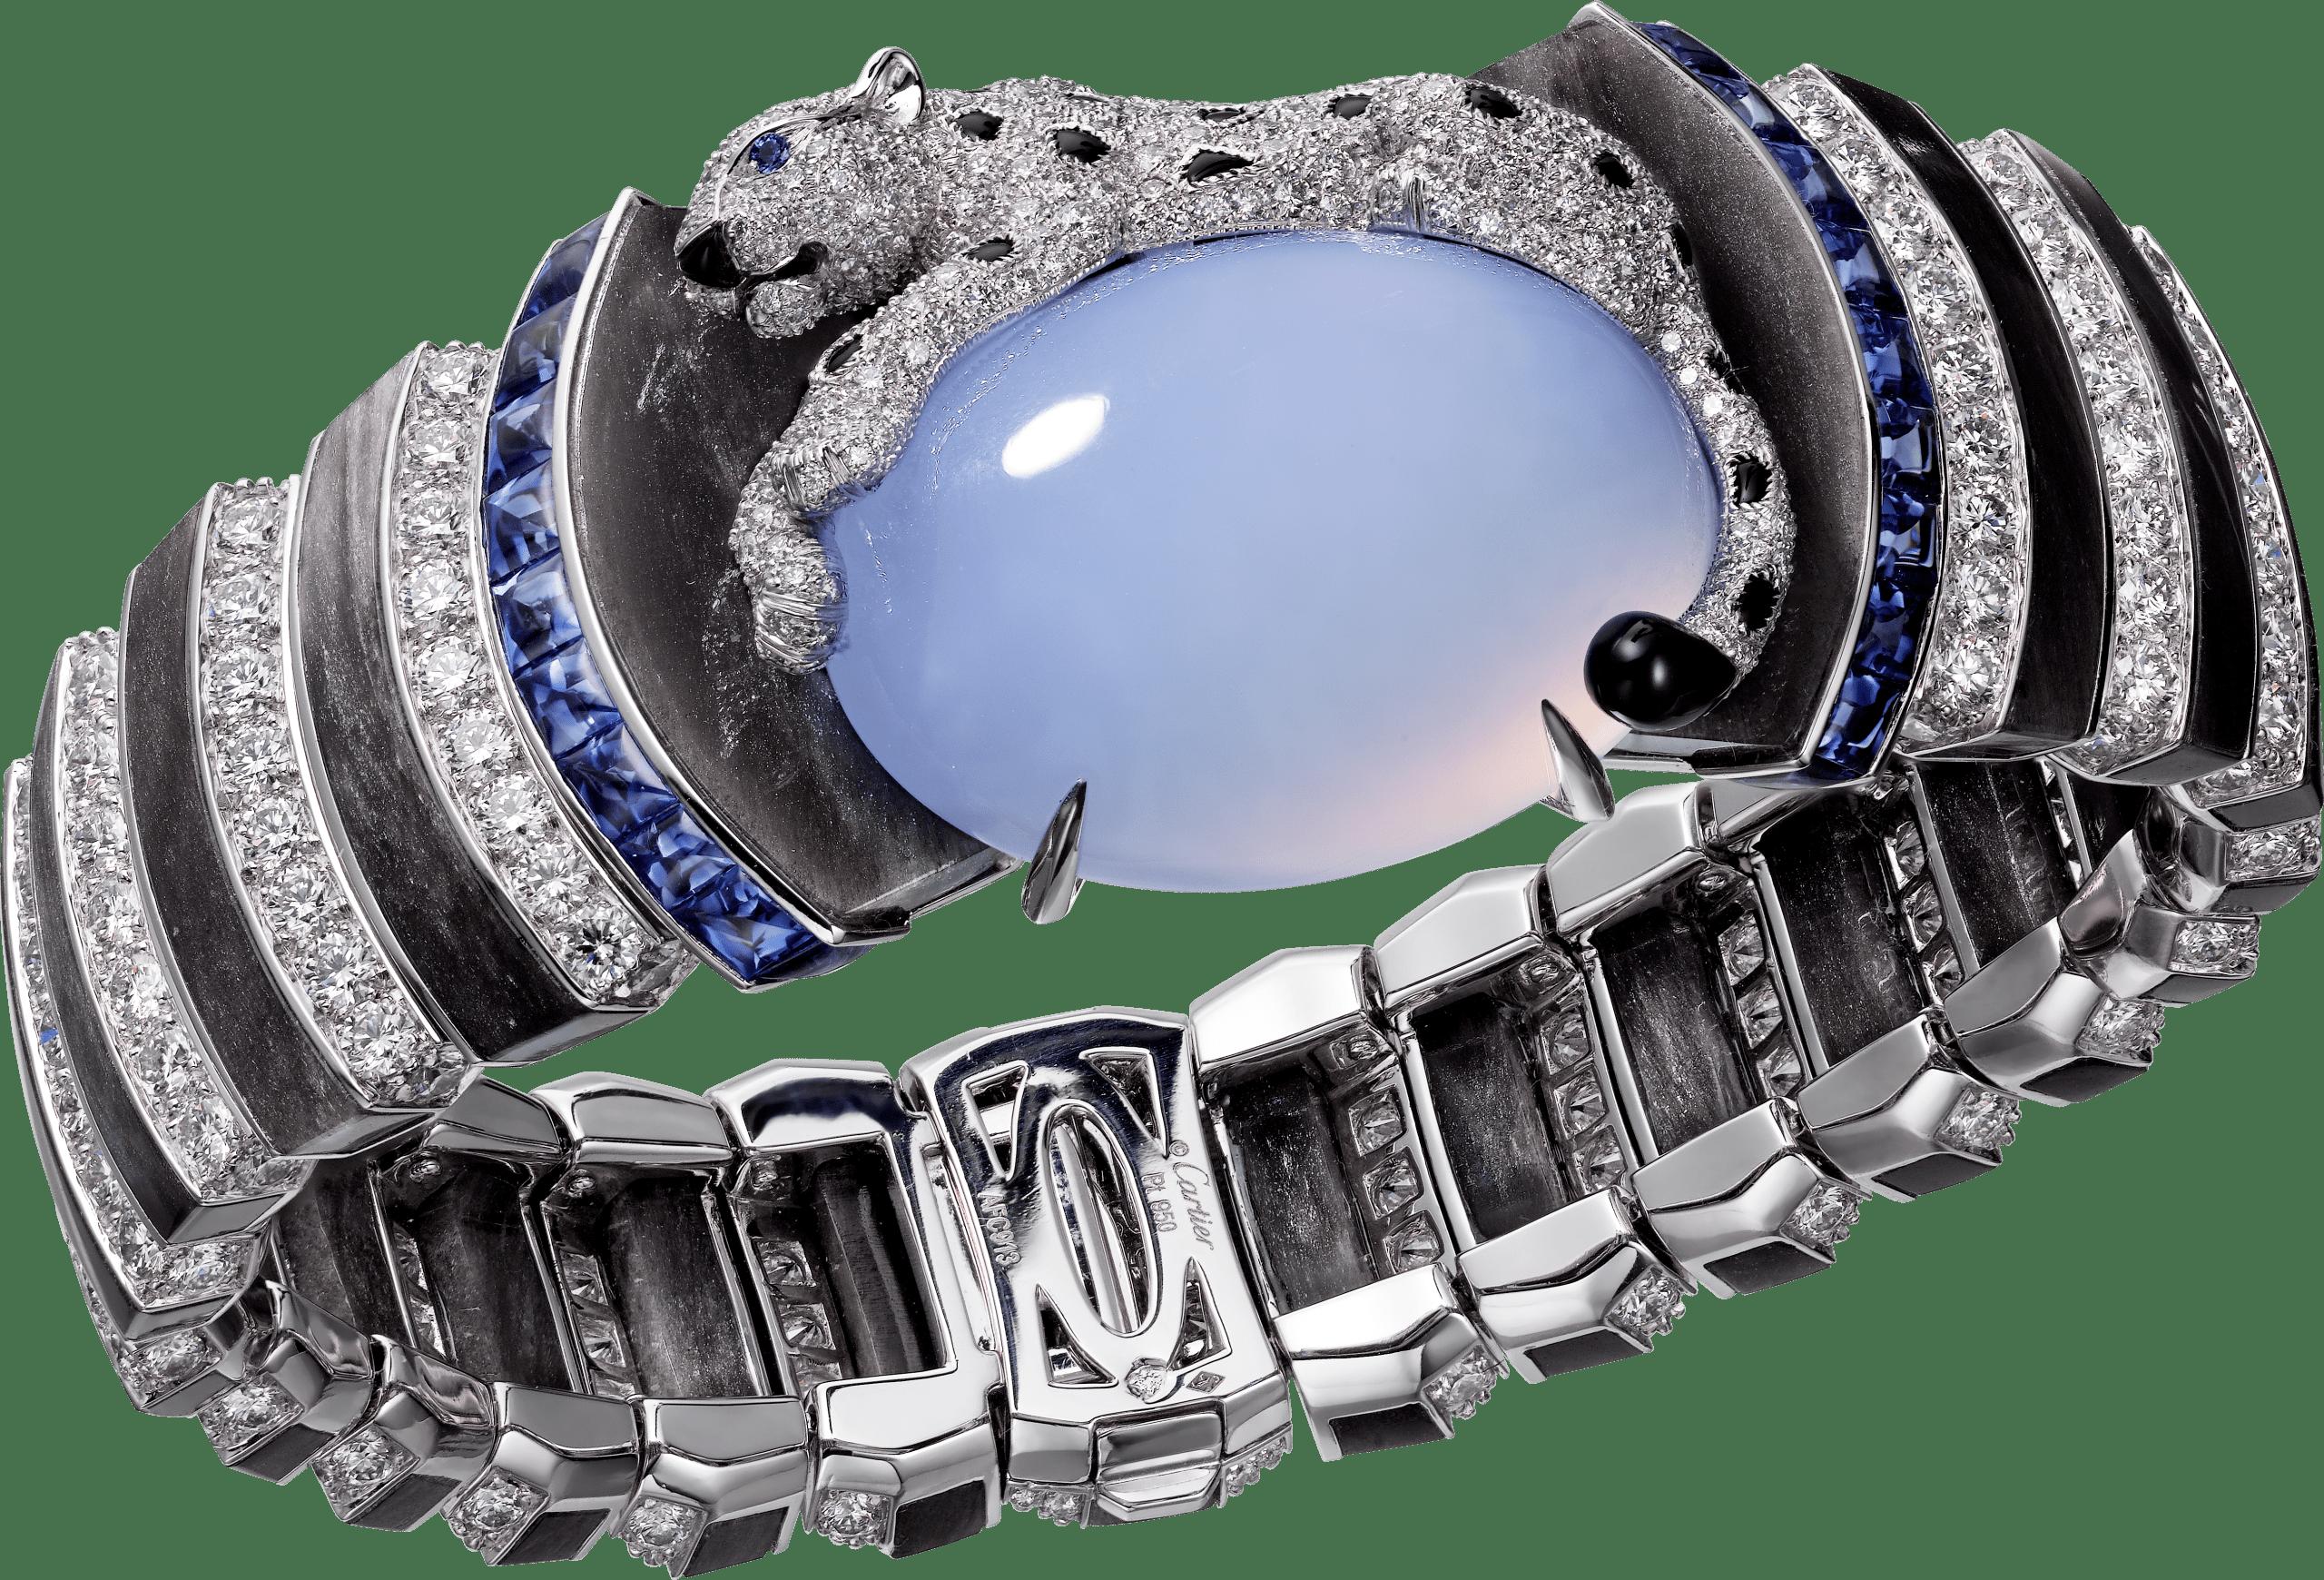 Cartier Royal美洲豹頂級珠寶系列藍玉髓手環鉑金,一顆重42.89克拉的凸圓形切割藍玉髓,藍寶石,黑曜岩,縞瑪瑙,圓形明亮式切割鑽石,參考價格約NT$ 27,500,000此作品上的美洲豹強悍而優雅,魅力四射,彷彿隨時預備從精密的幾何形狀中一躍而出。這貓科動物王者守護著一顆重達42.89克拉的凸圓形玉髓,玉髓清澈的色澤與黑白的對比互相輝映,可見卡地亞已將幾何造型和自然風格兩大元素以全新方式融為一體。